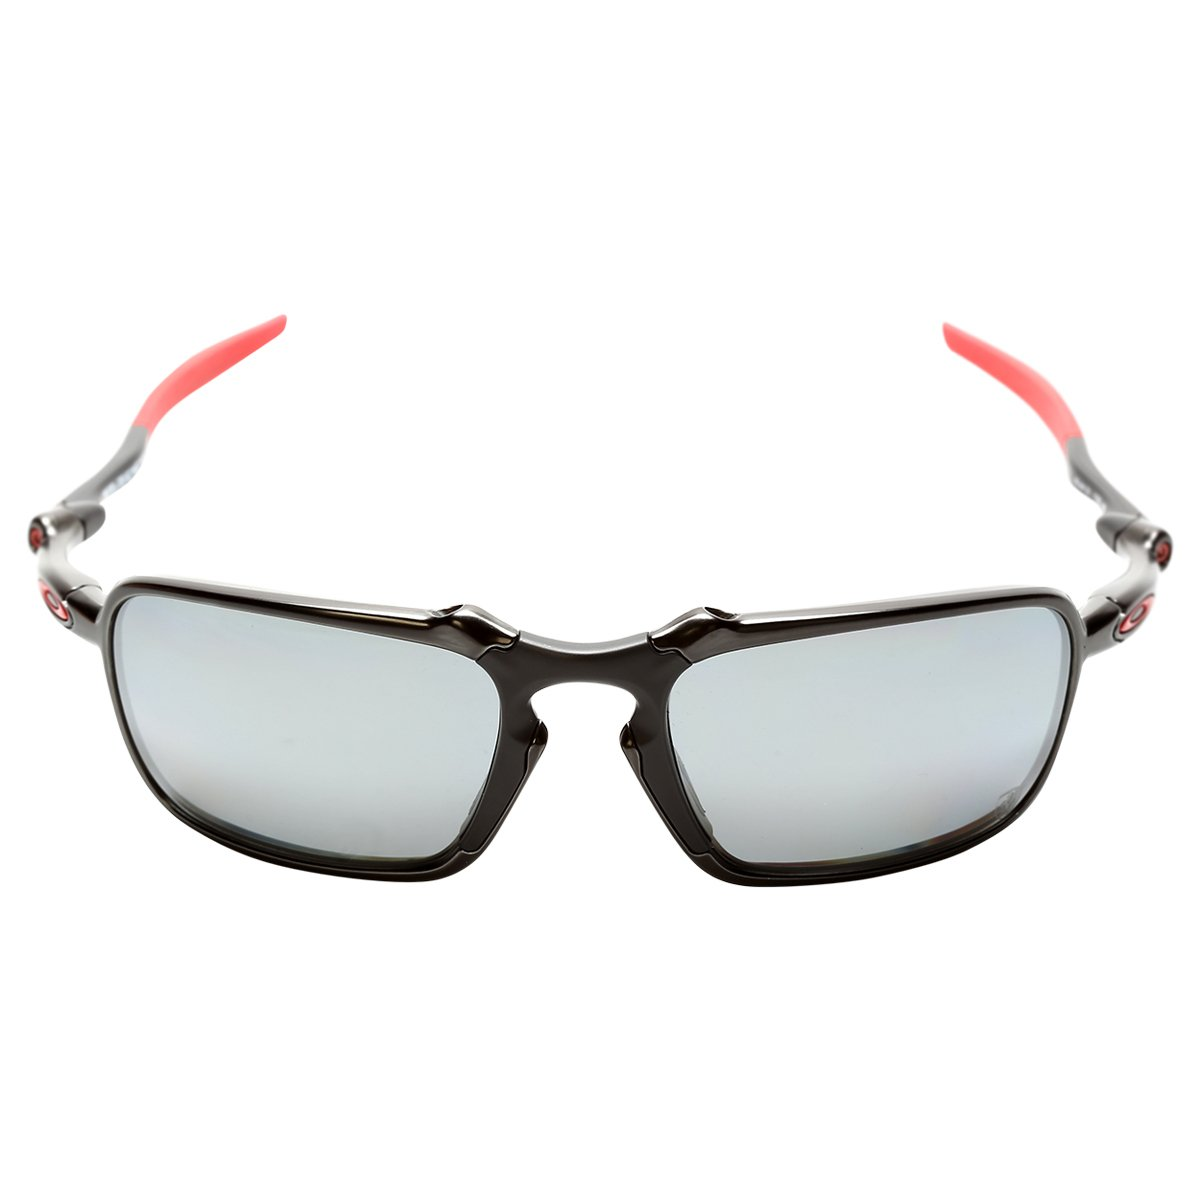 ... Óculos Oakley Ferrari Badman Dark Carbon - Iridium Polarizado ... f3cbe8dab5